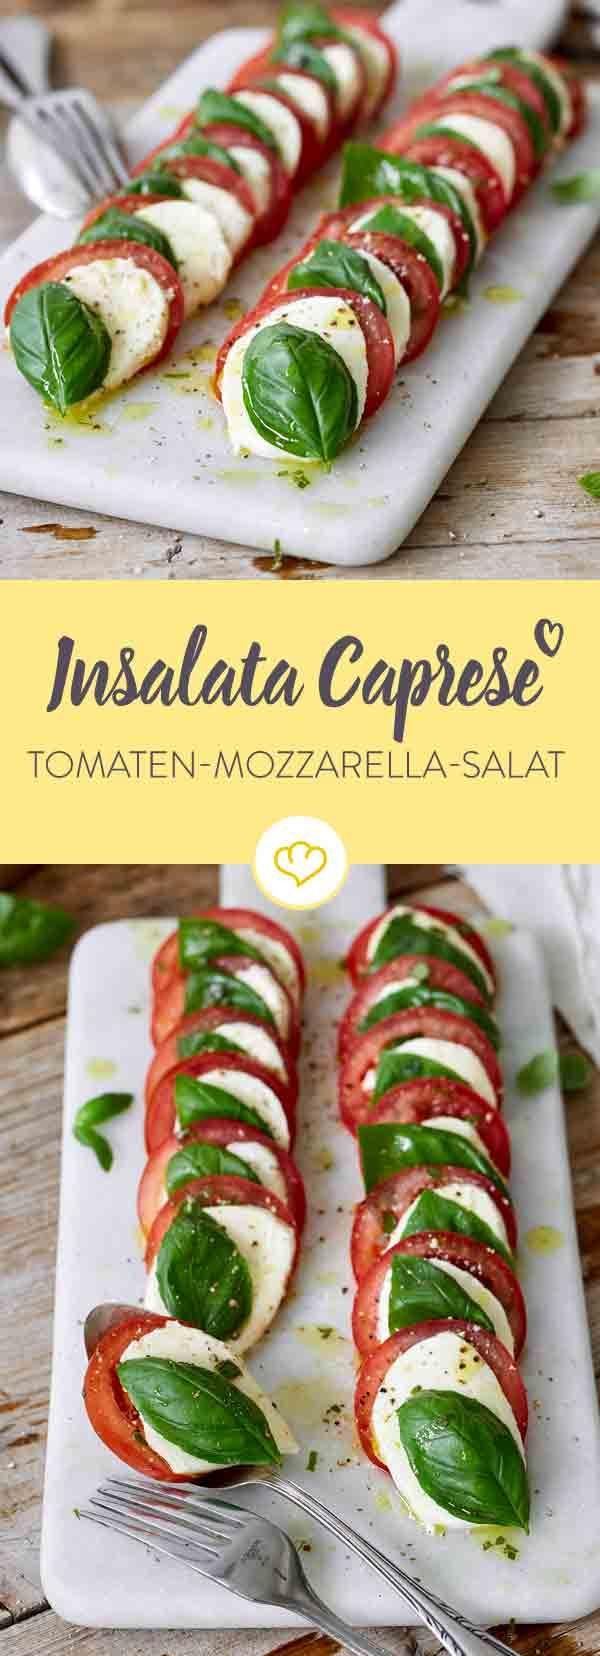 Insalata Caprese: Mozzarella-Tomatensalat   – Tomatenrezepte – alles andere als langweilig